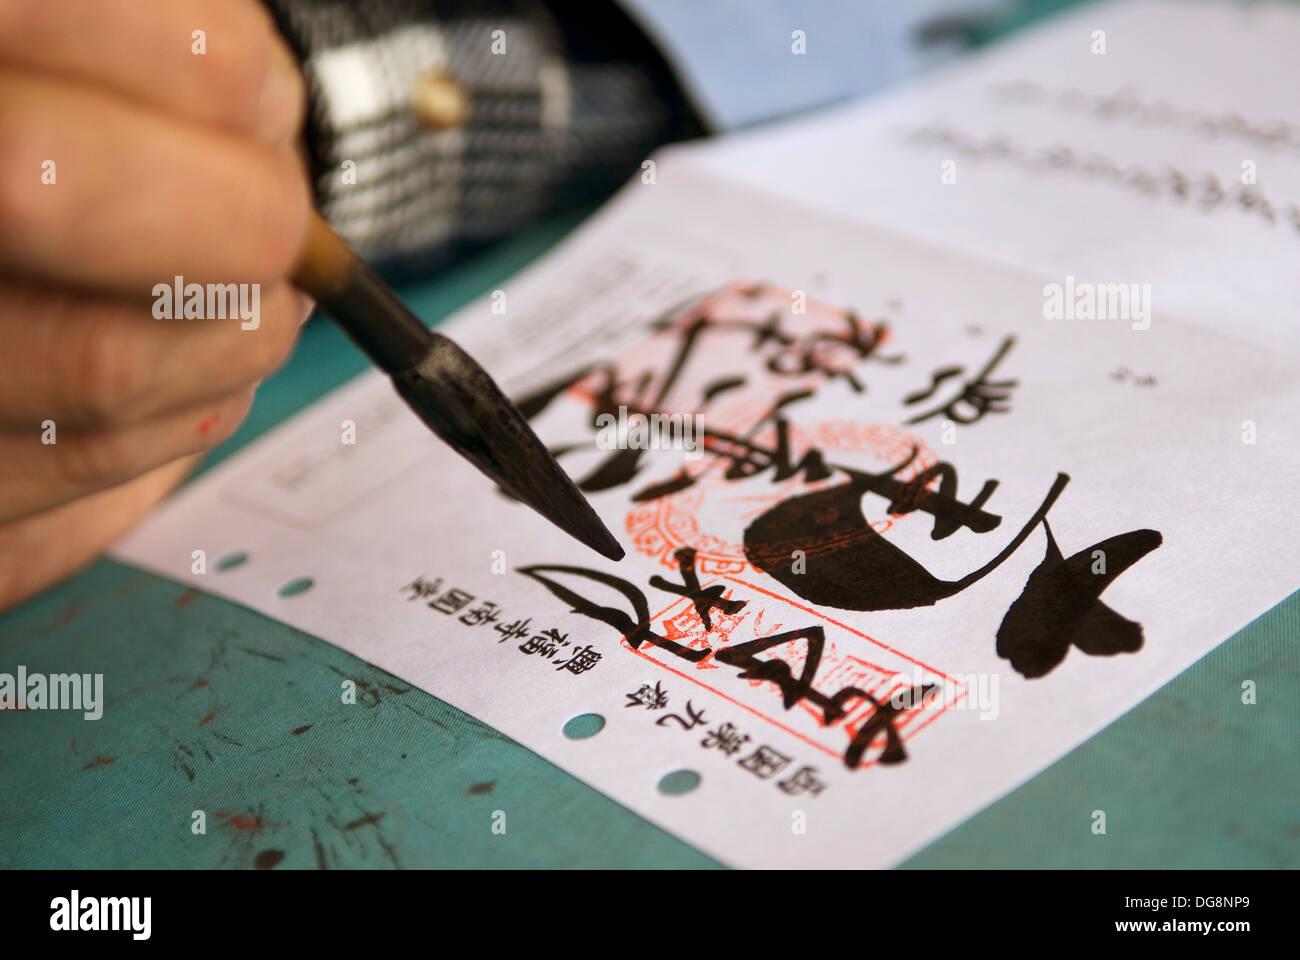 calligraphie, Nara, Japon - Stock Image